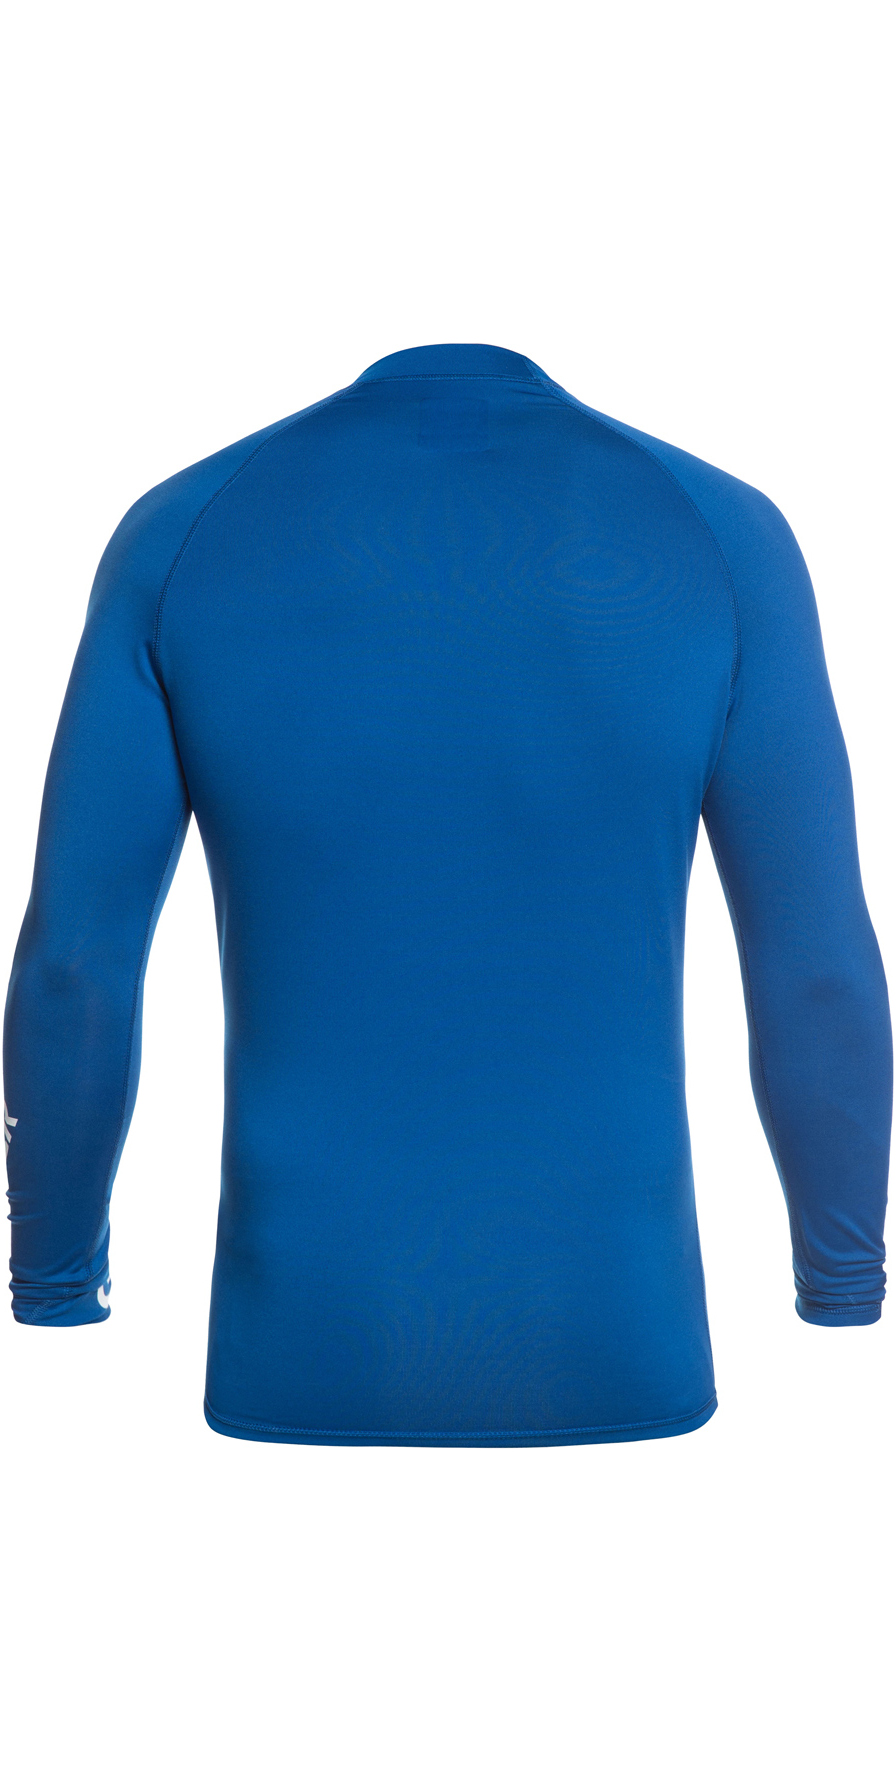 2019 Quiksilver All Time Long Sleeve Rash Vest Royal Blue EQYWR03137